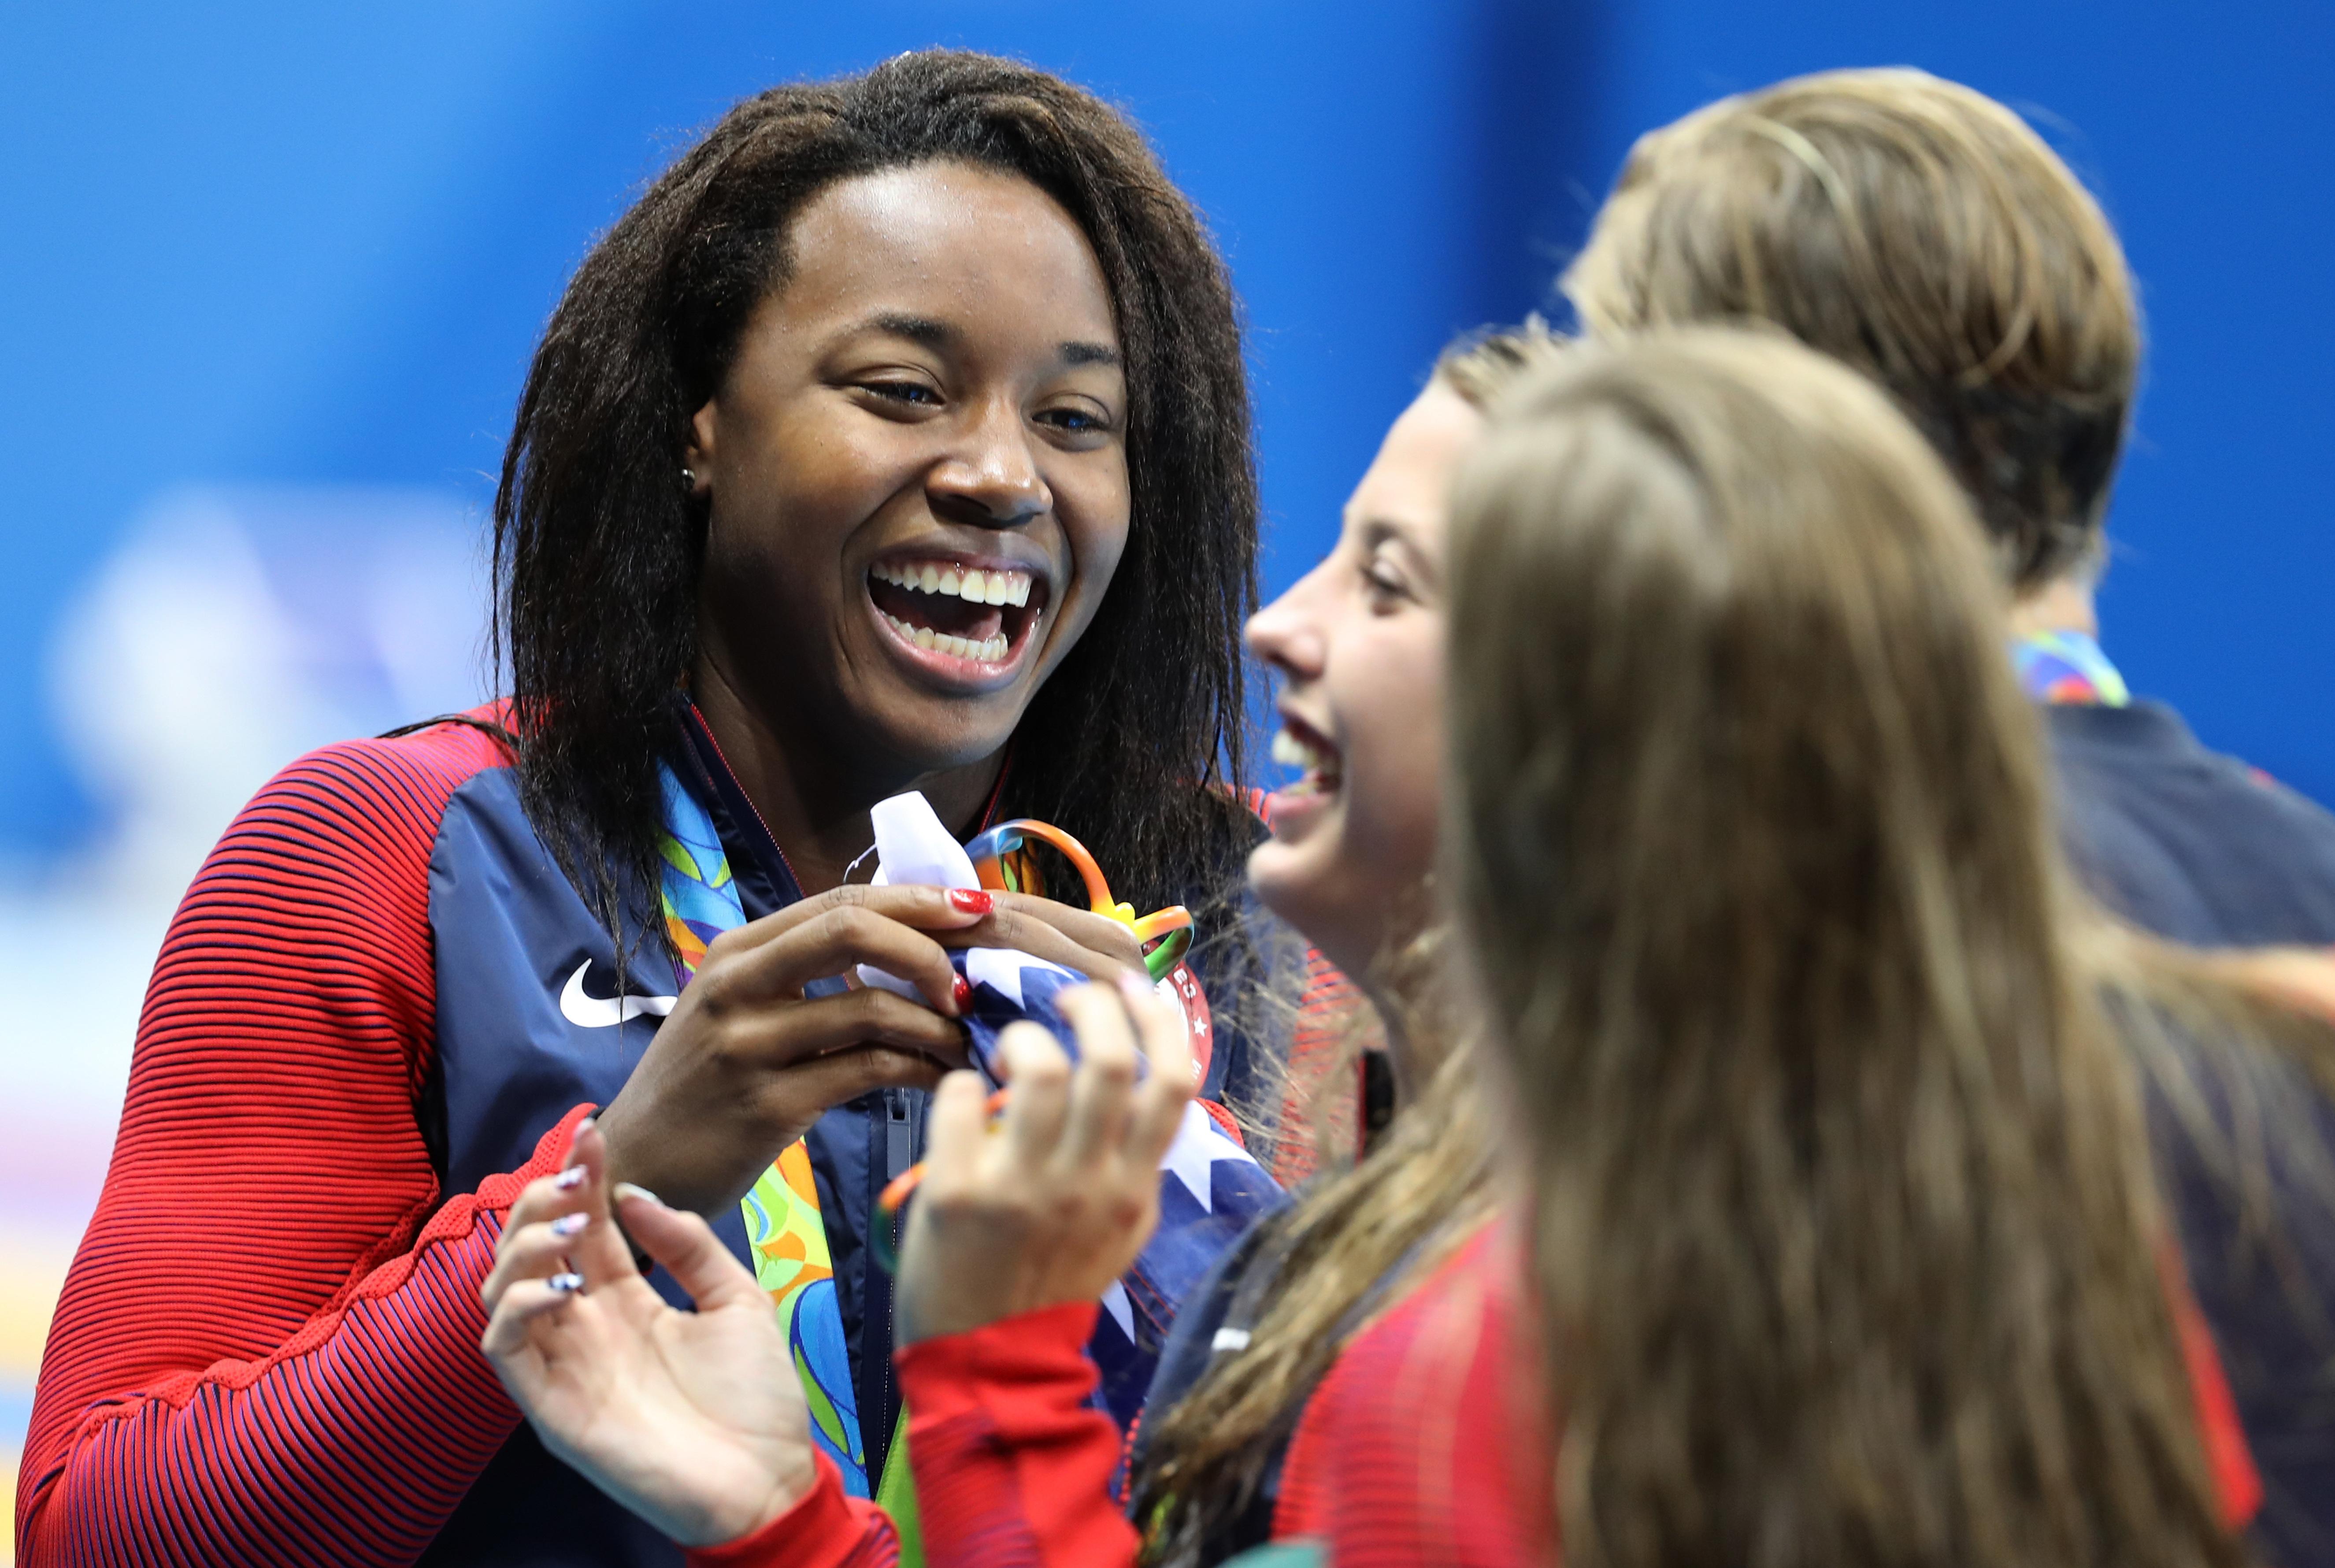 Phelps Helps U.S. Men Win Relay Gold In Rio; Manuel Helps Women Snare Gold